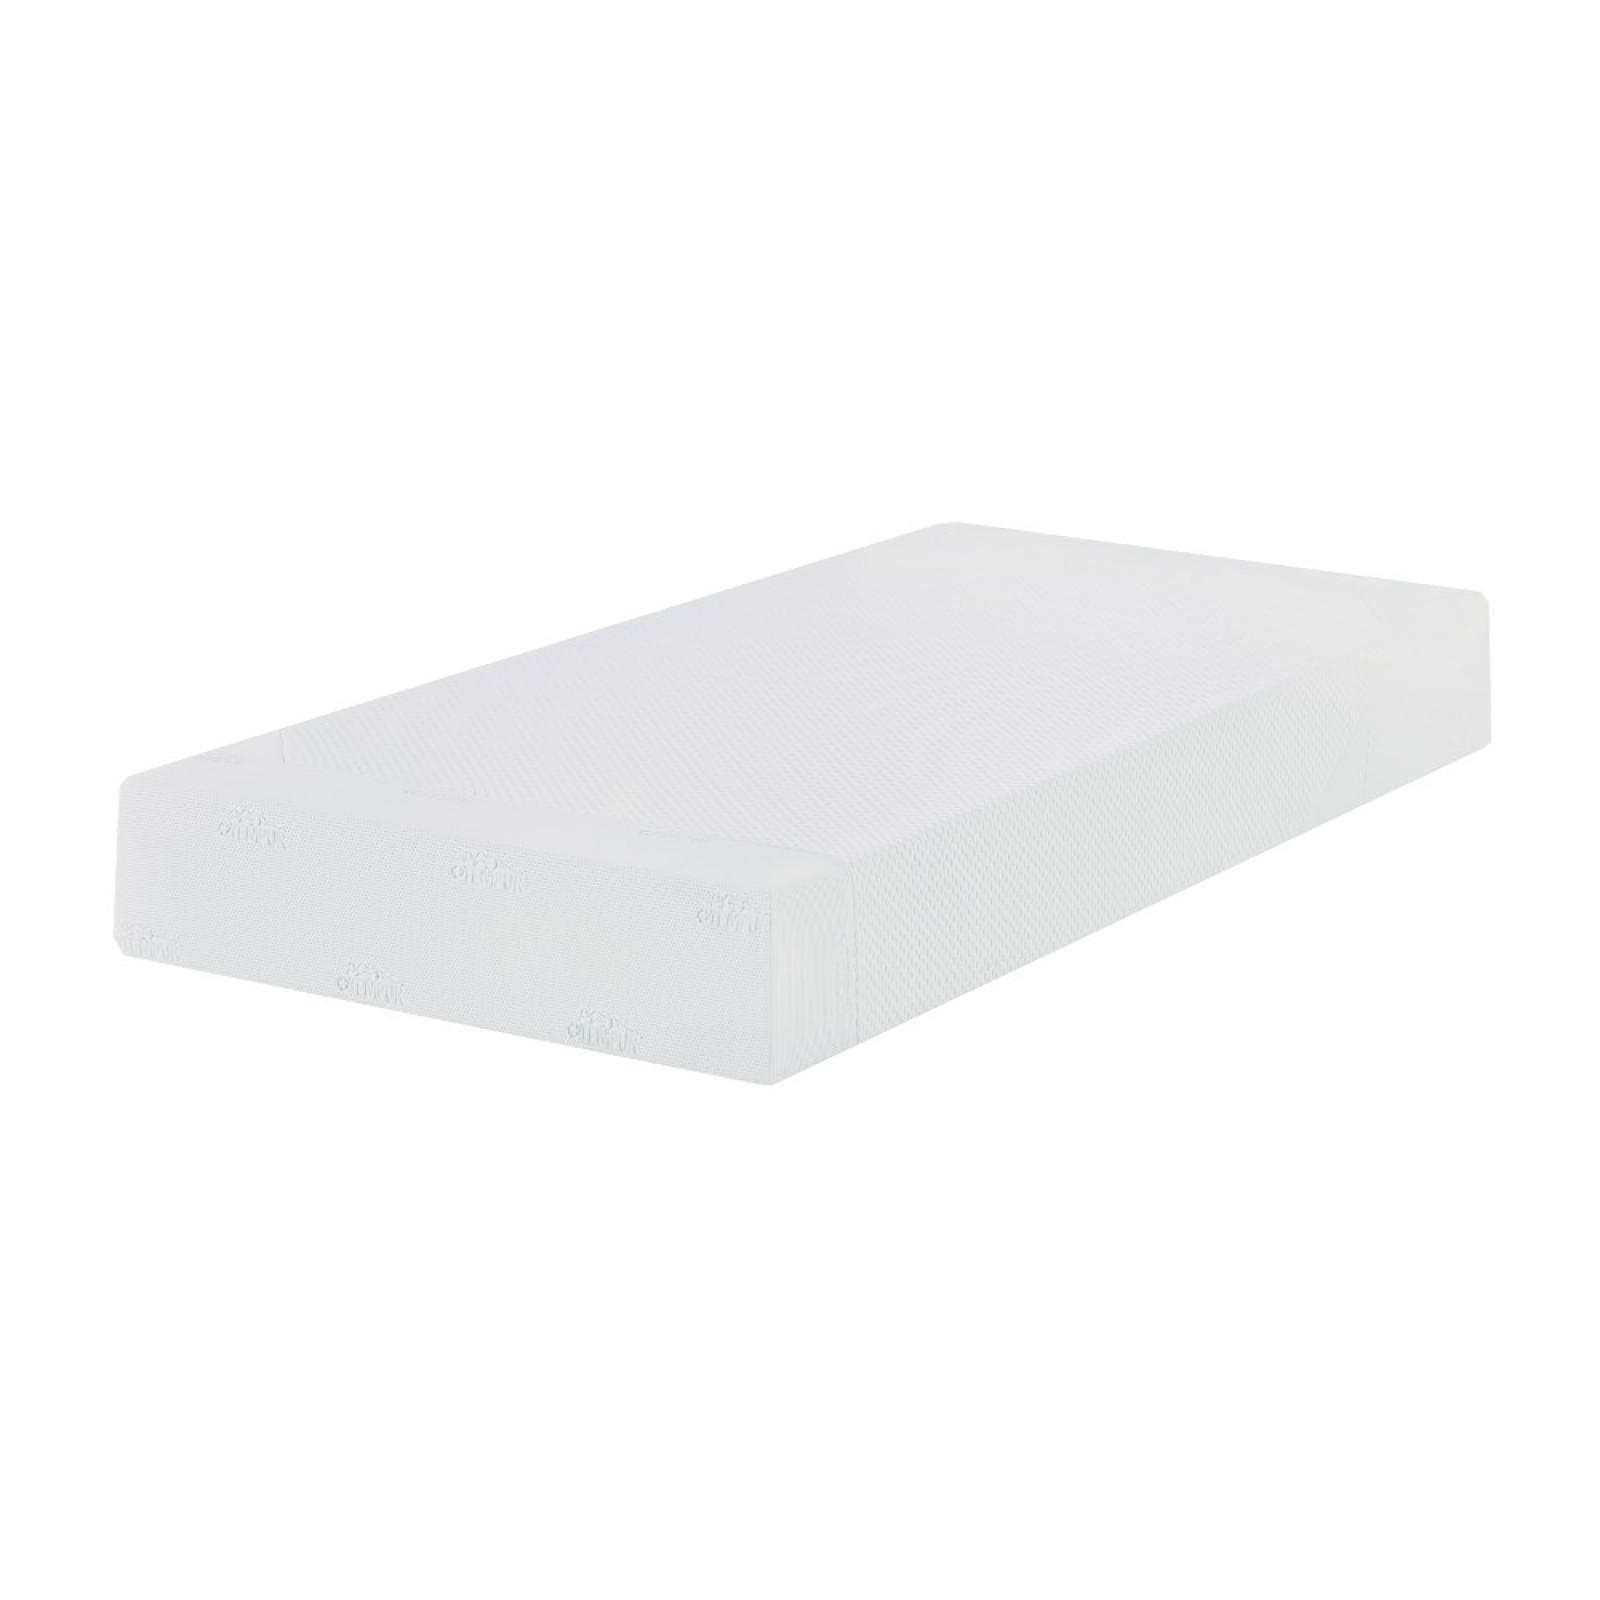 tempur matratze sensation 21 gr e 90x200 cm high mobility schicht ebay. Black Bedroom Furniture Sets. Home Design Ideas